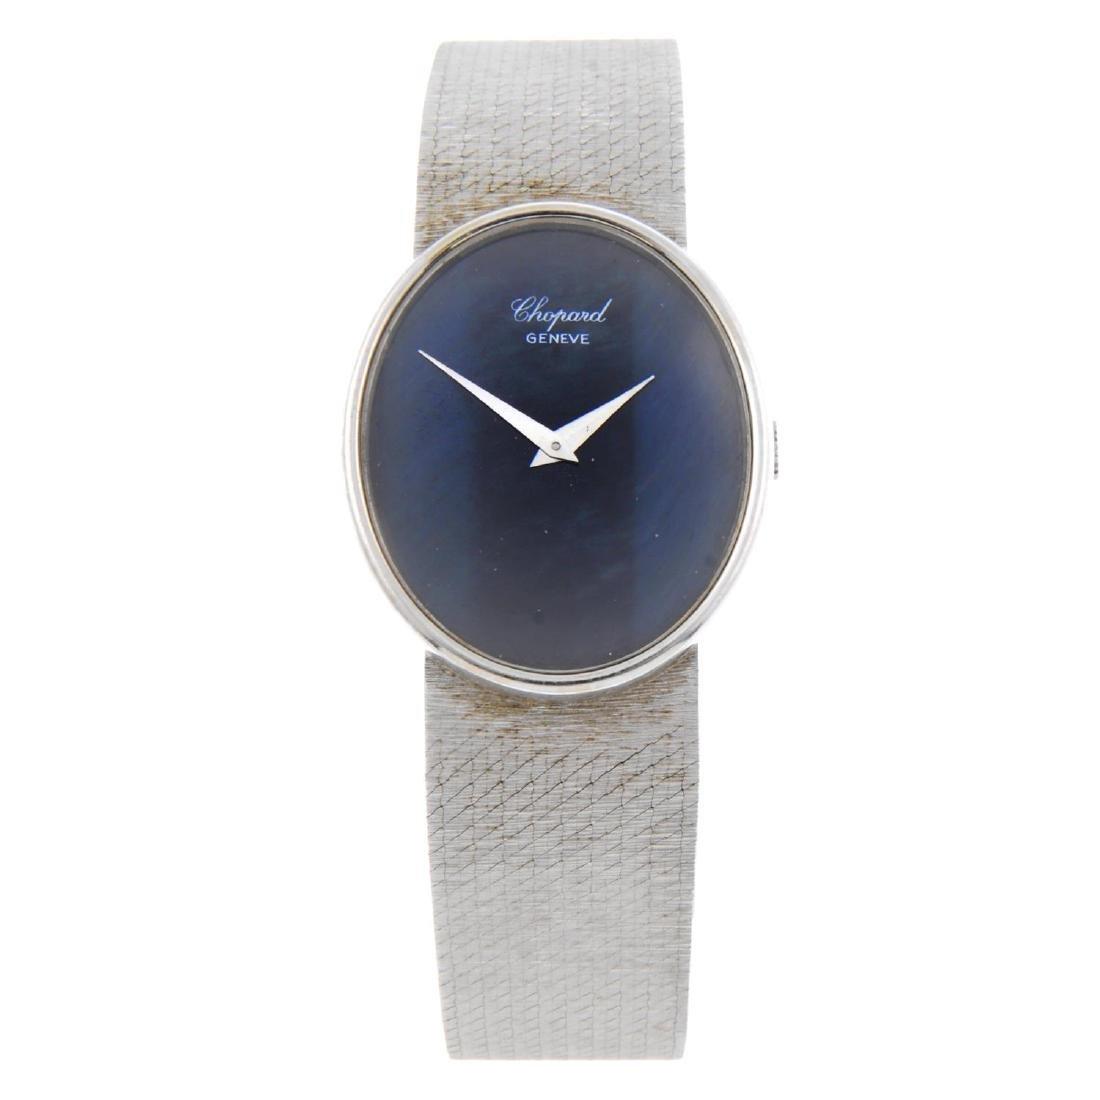 CHOPARD - a gentleman's bracelet watch. White metal